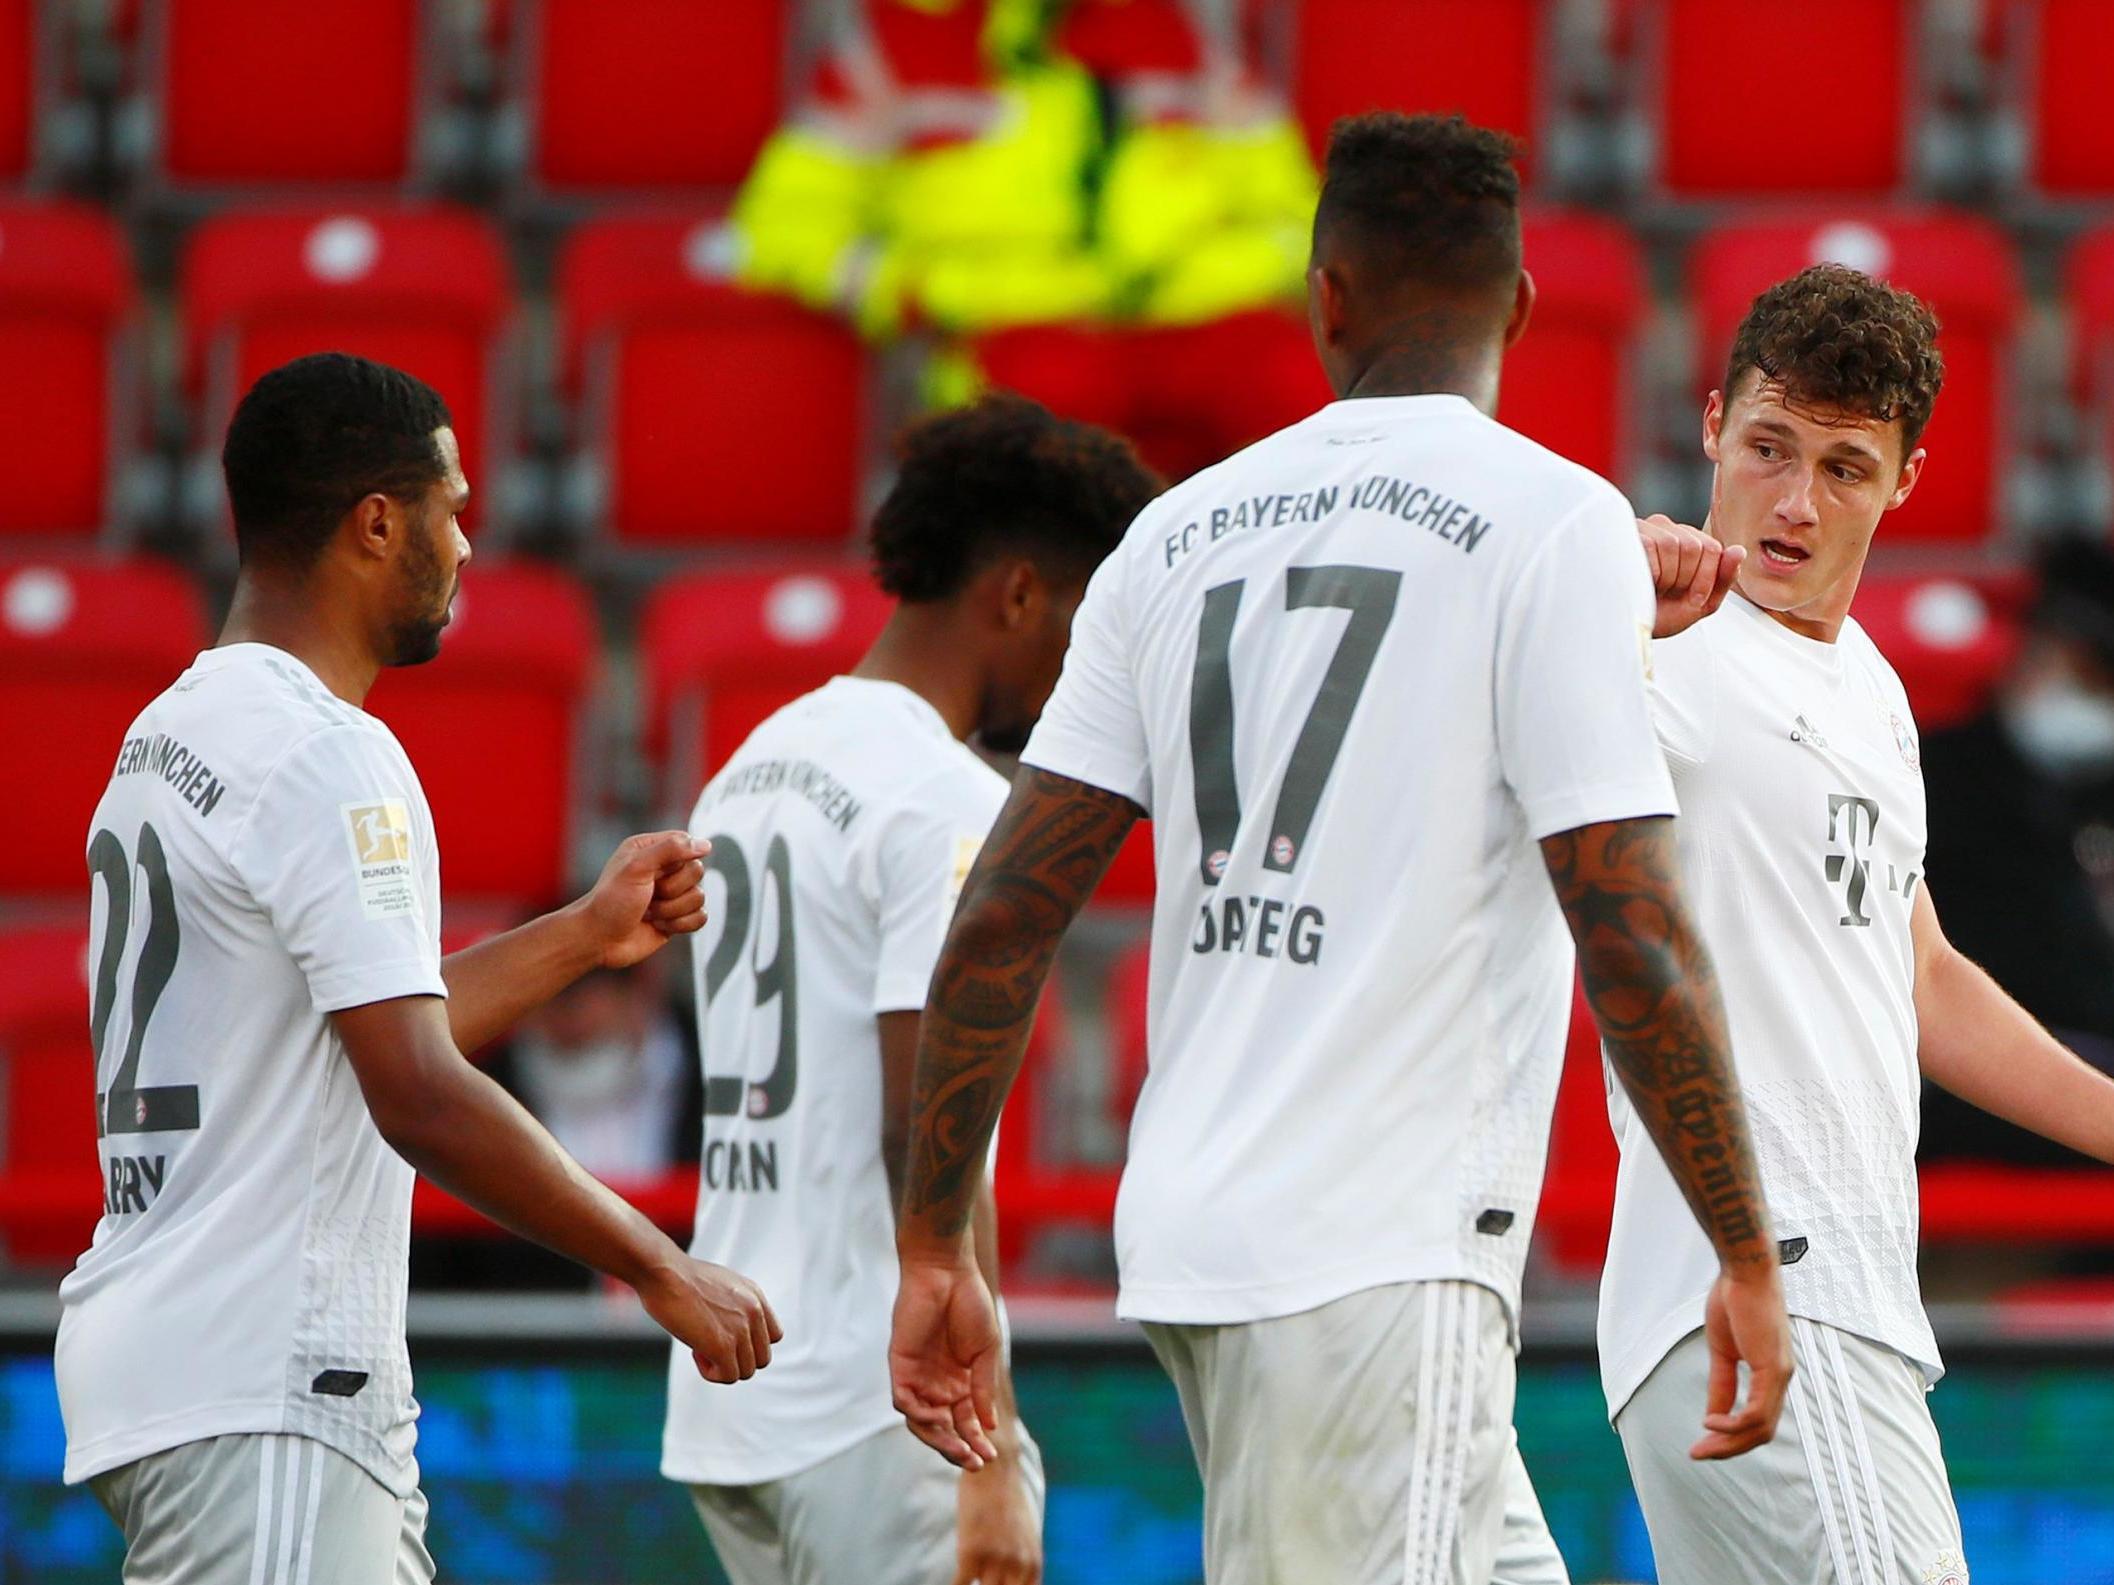 Bayern Munich vs Eintracht Frankfurt prediction: How will Bundesliga fixture play out today?